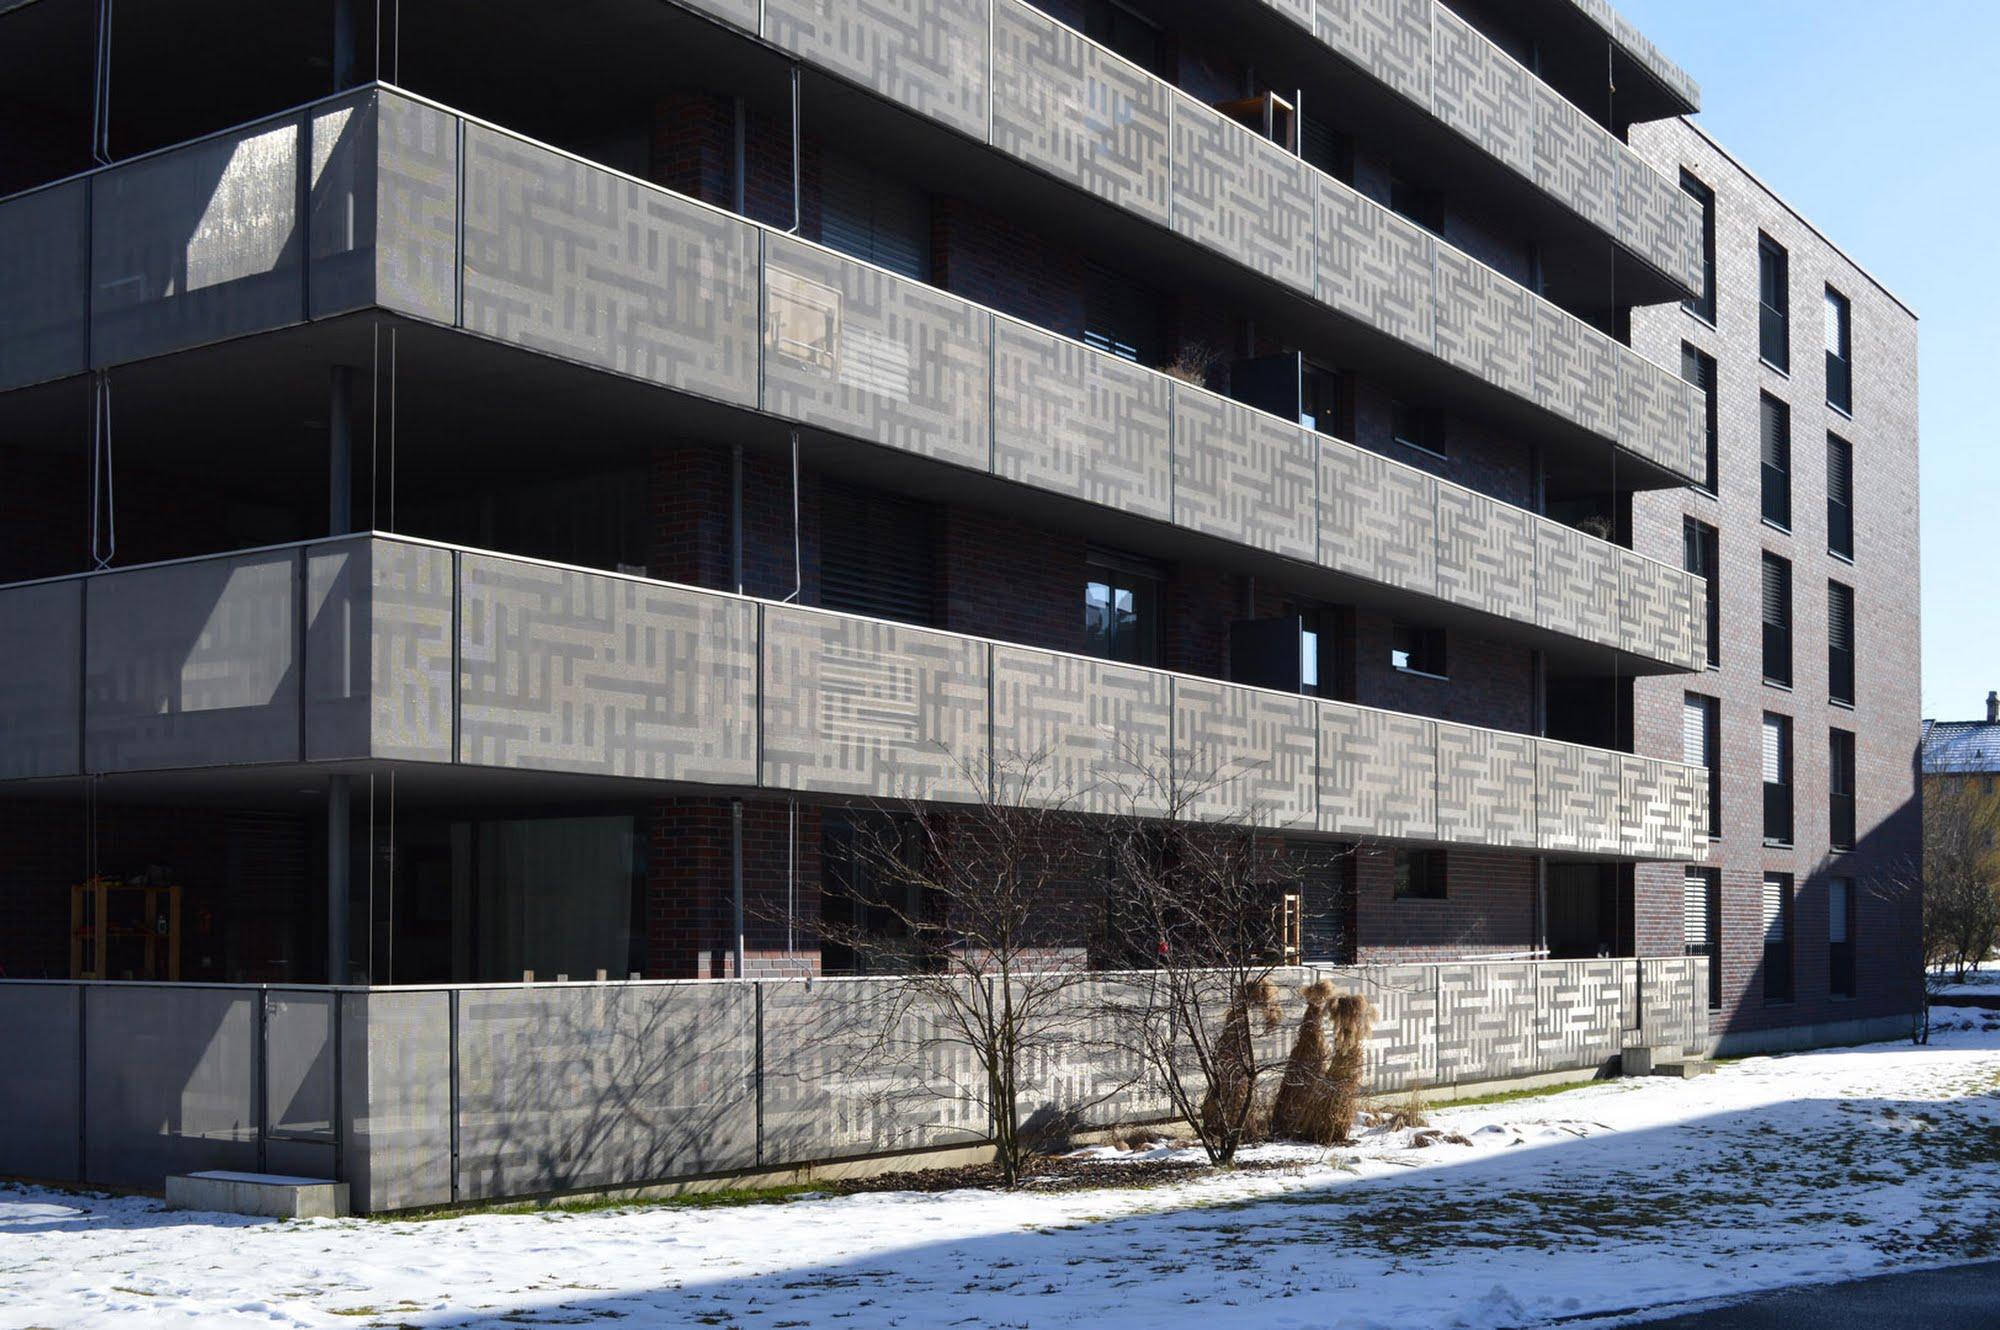 Sidi Areal Winterthur